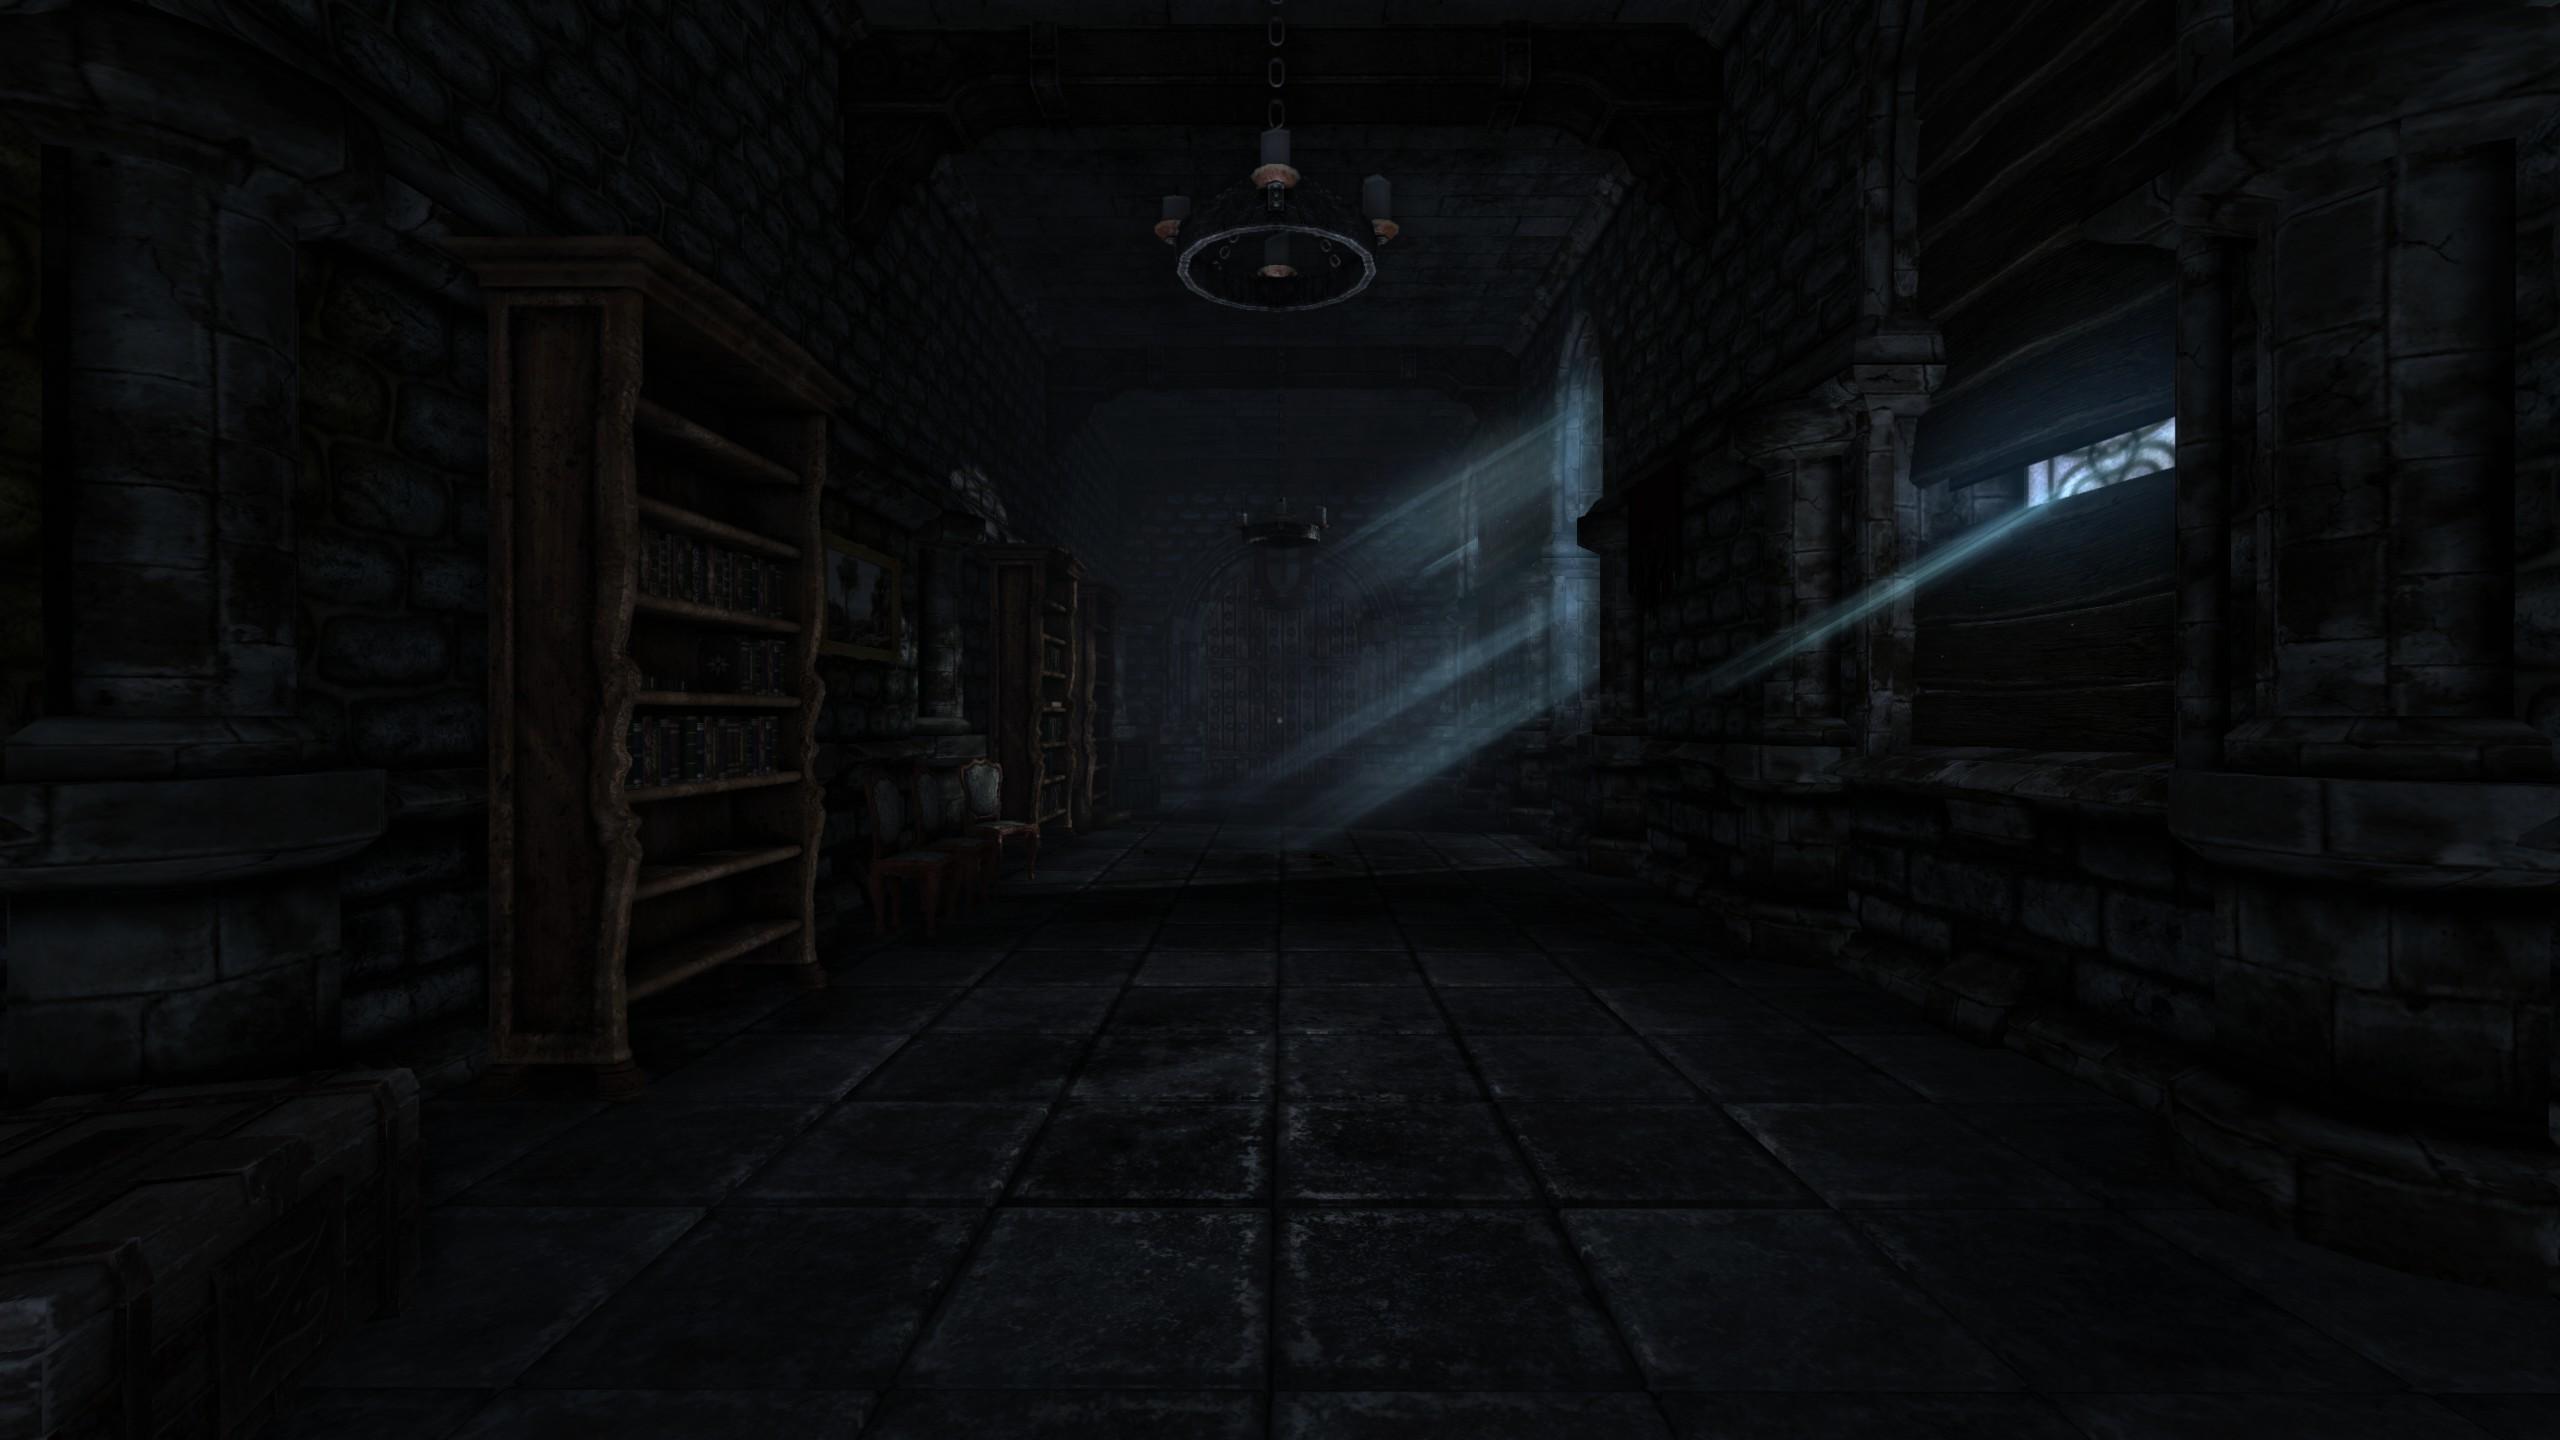 Amnesia the Dark Descent Wallpaper 86 images 2560x1440